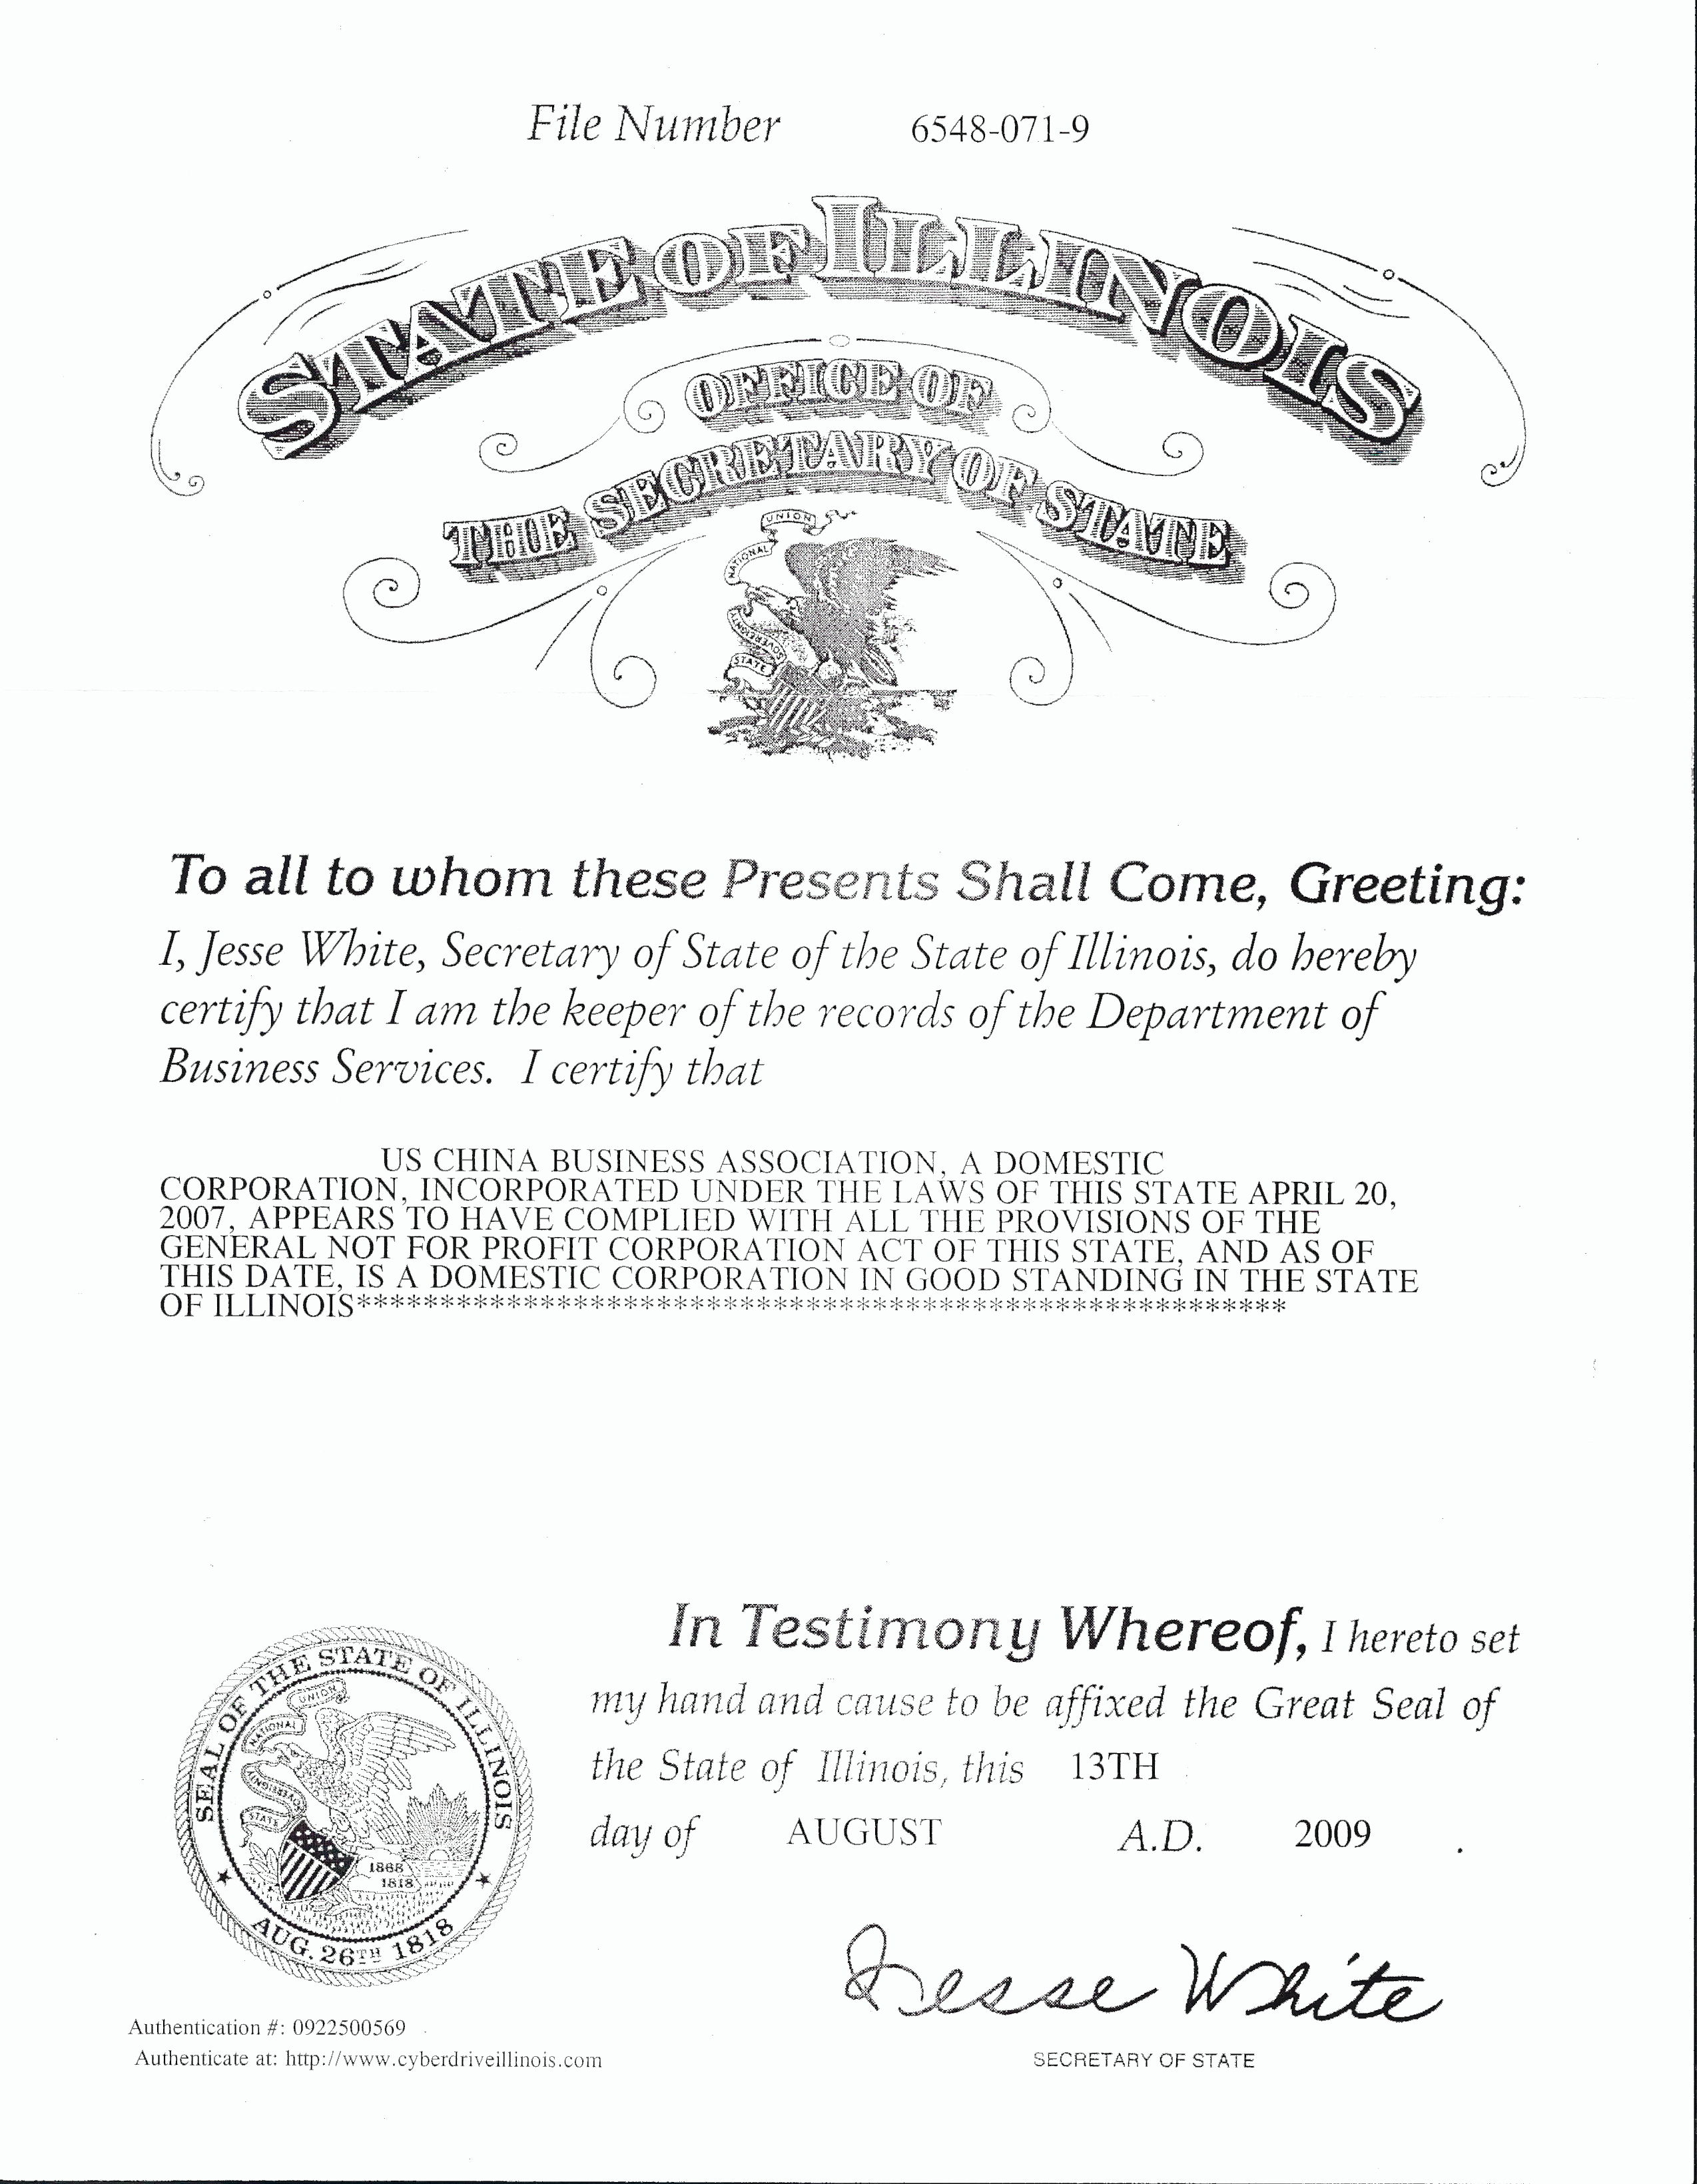 Us China Business Association Printed Materials